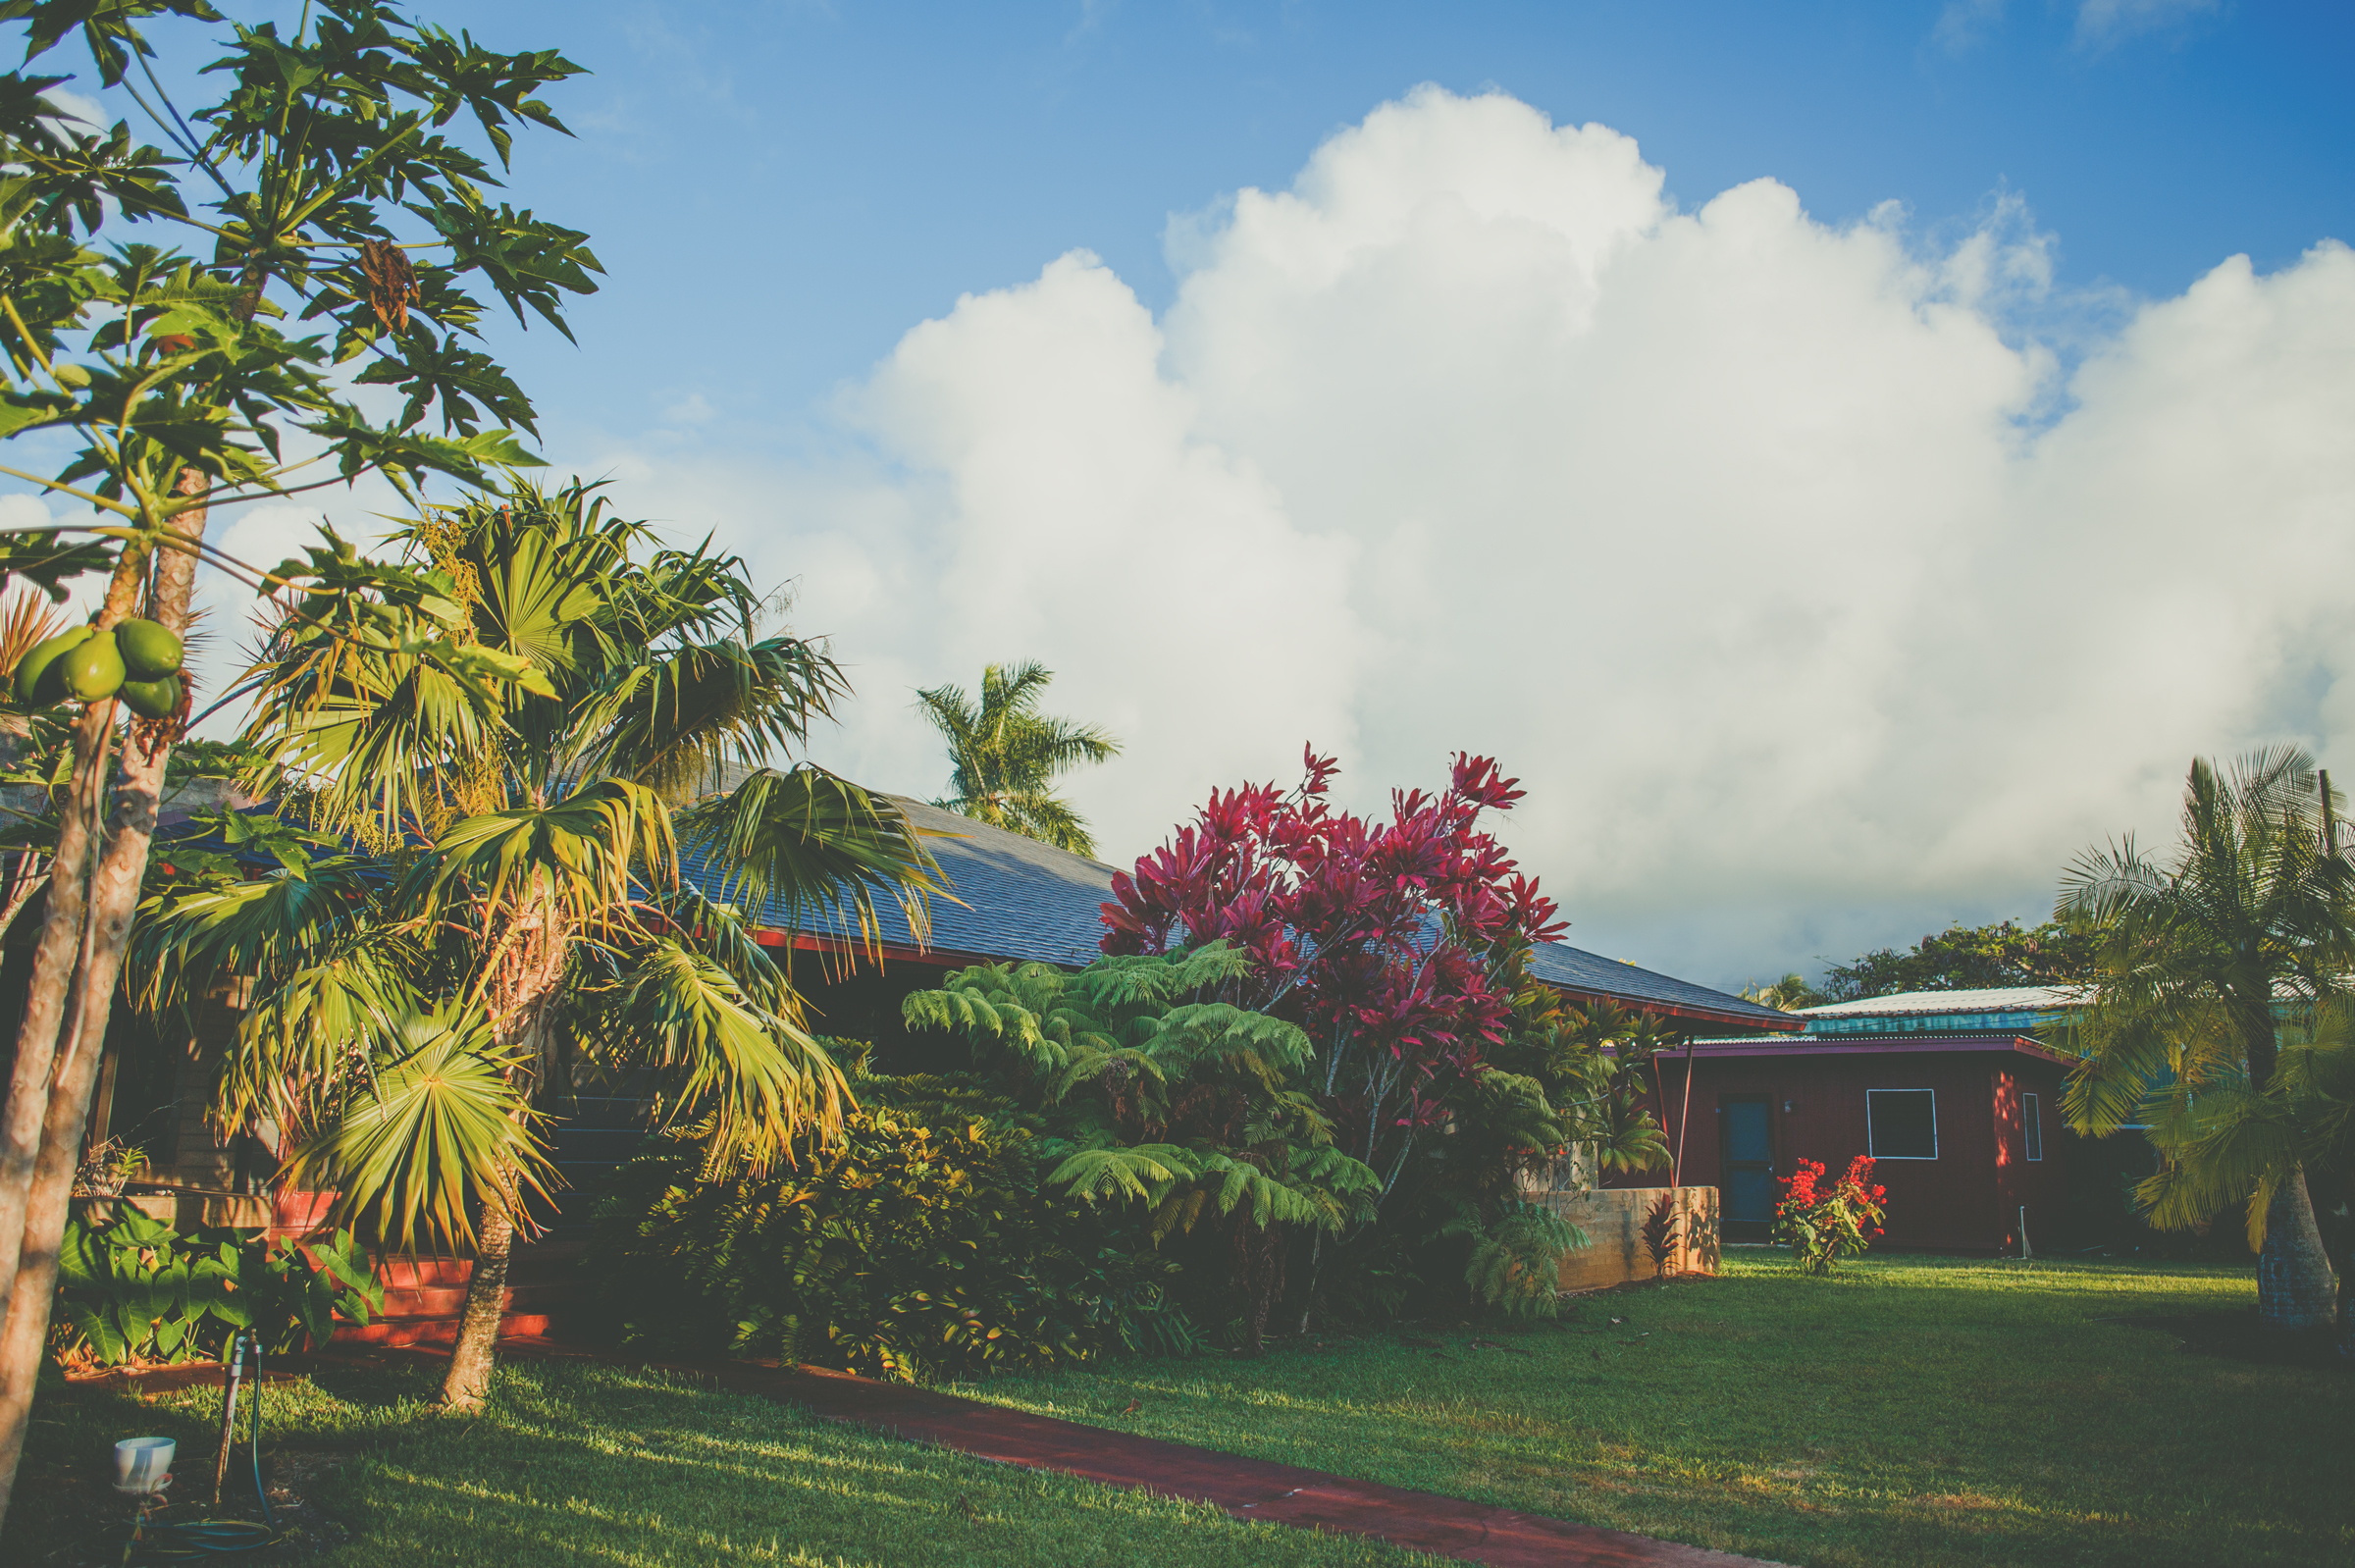 IMG_2252-KAUAI-HAWAII-JENNIFER-PICARD-PHOTOGRAPHY.jpg